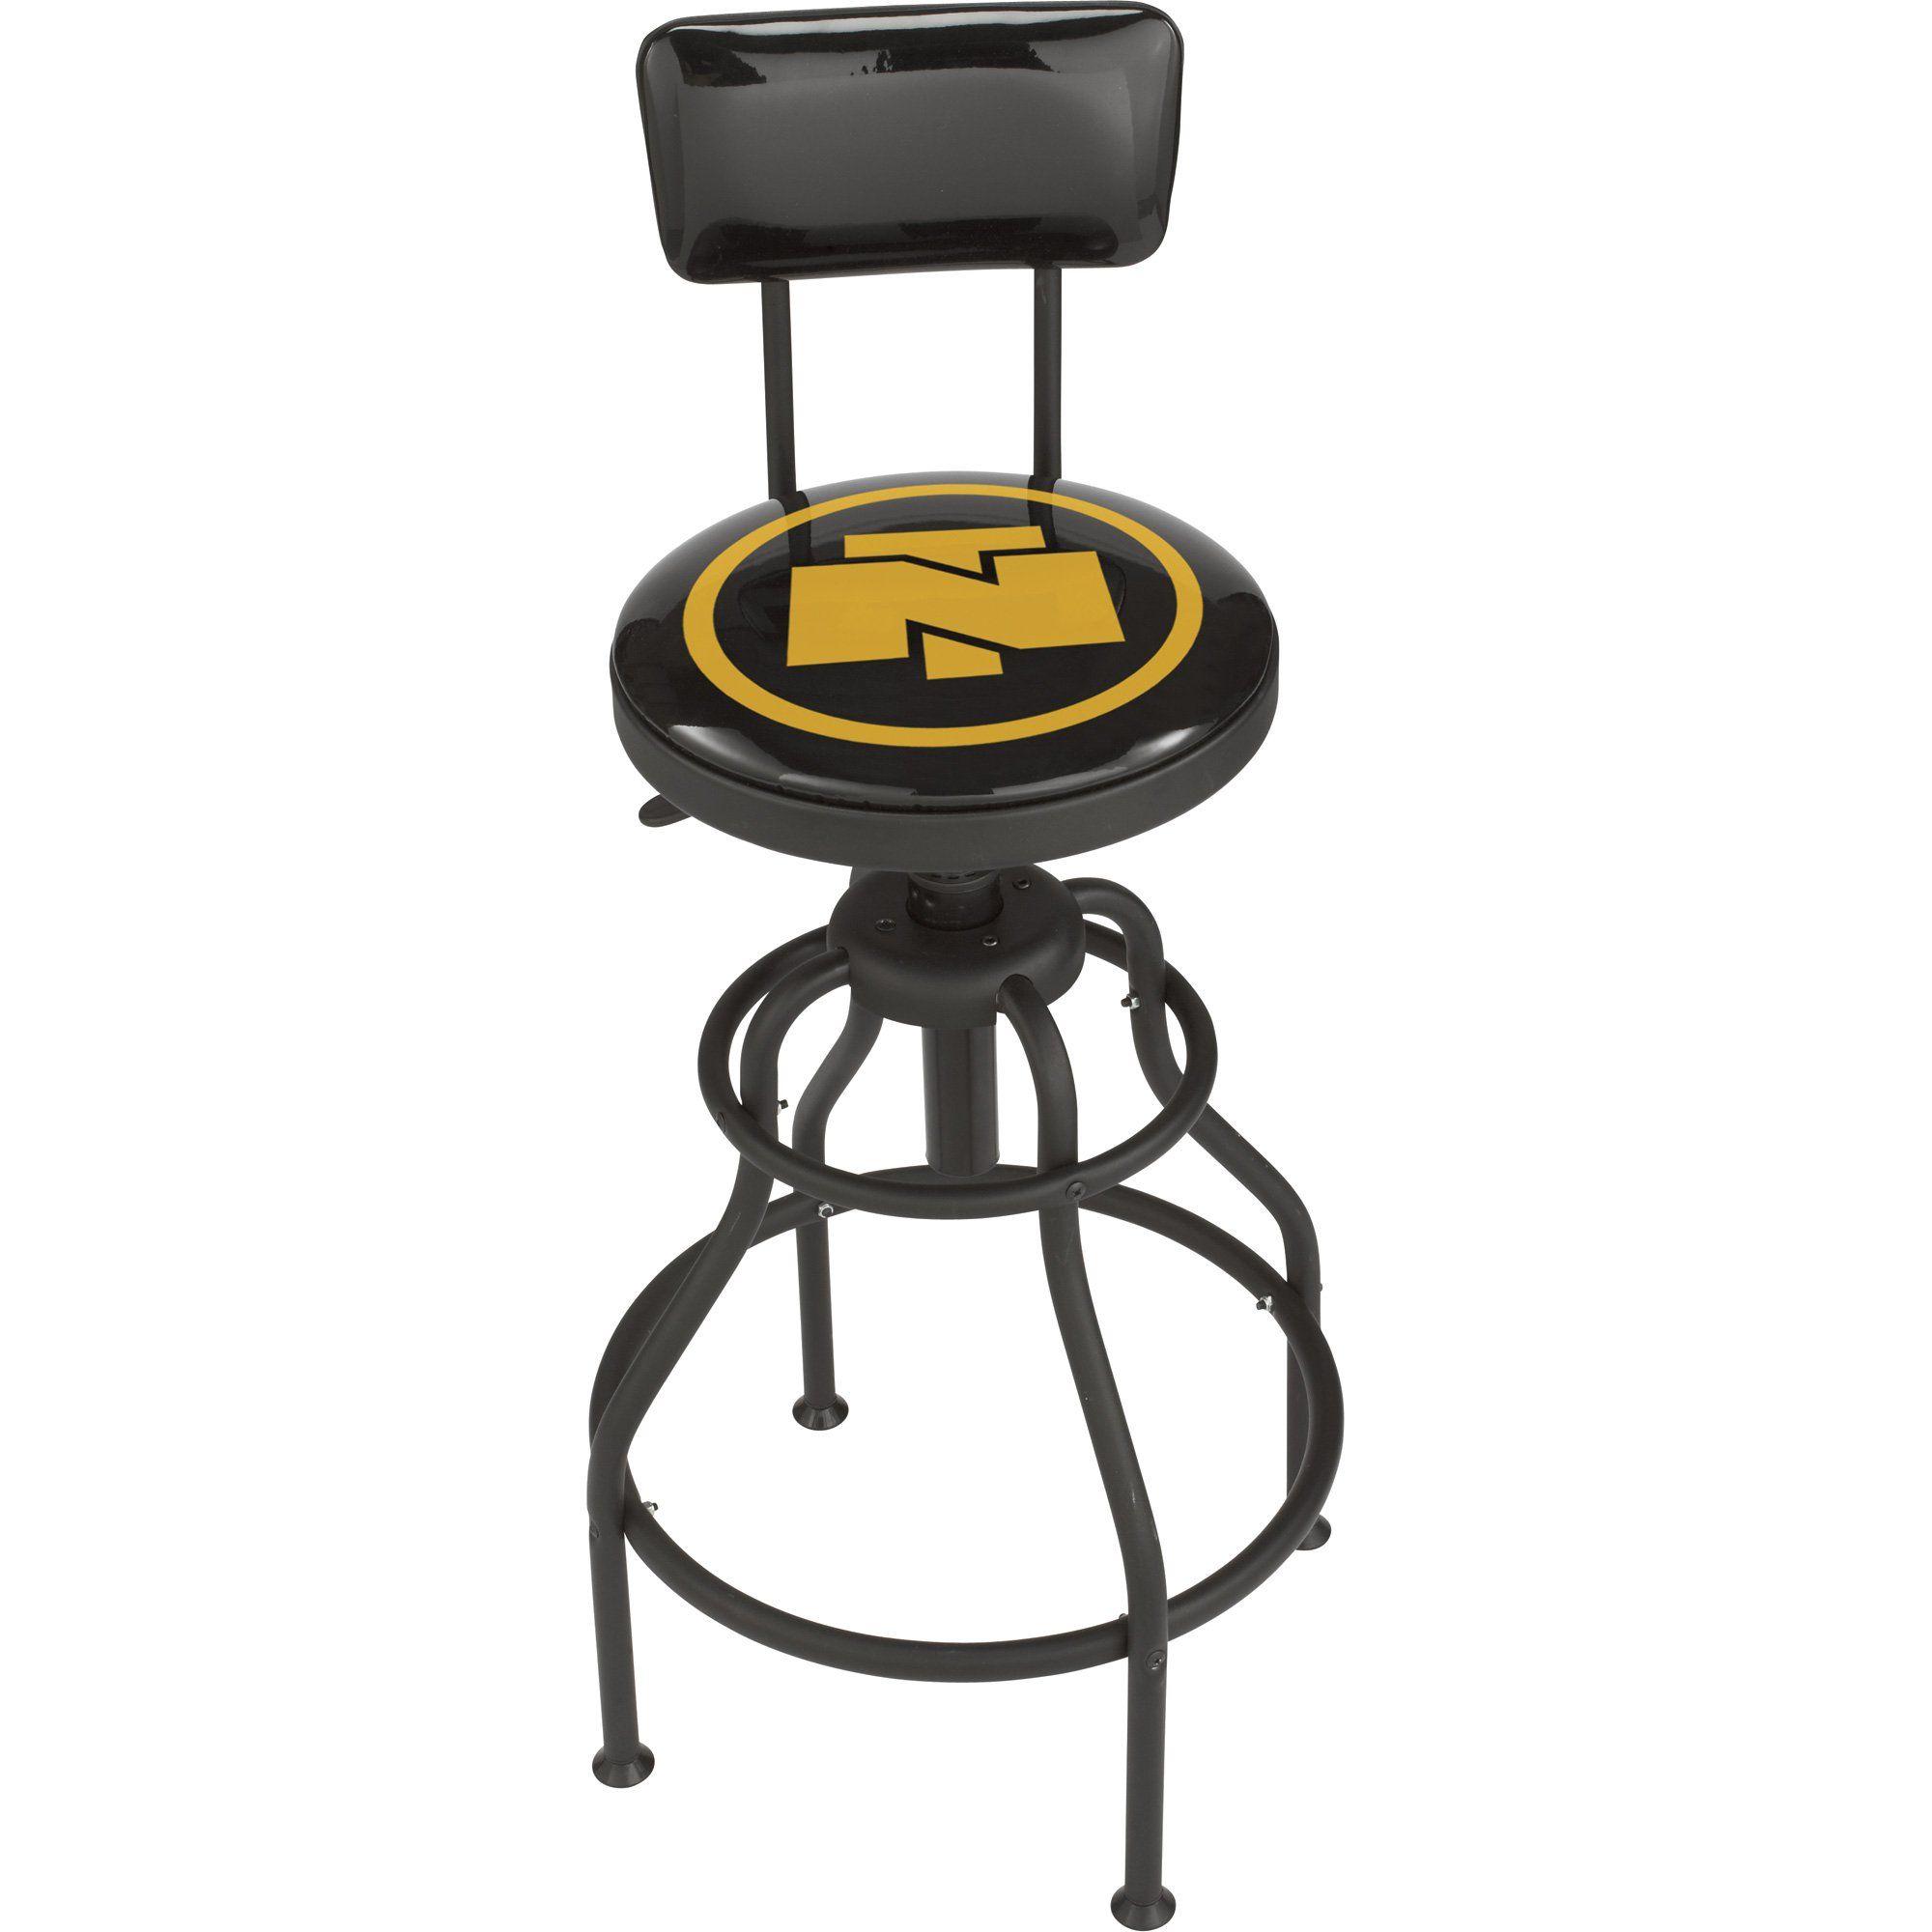 swivel dp amazon automotive bar big stool seat shop black stools torin red com